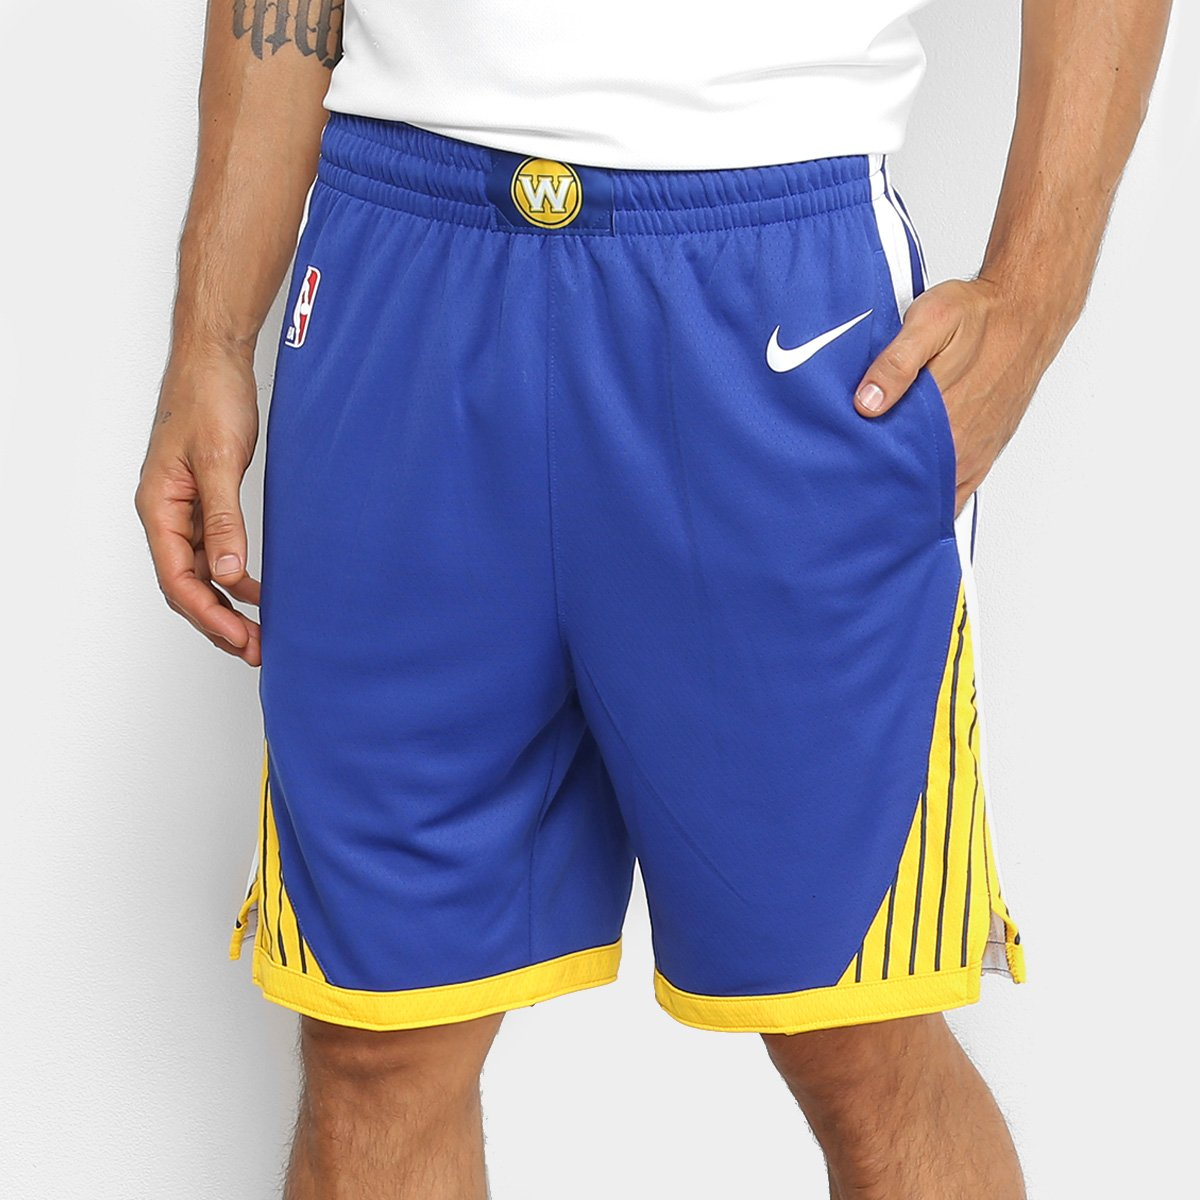 8a5c2d561b4c3 Bermuda NBA Golden State Warriors Nike Icon Swingman Road Masculina - Azul  e Branco | Loja NBA